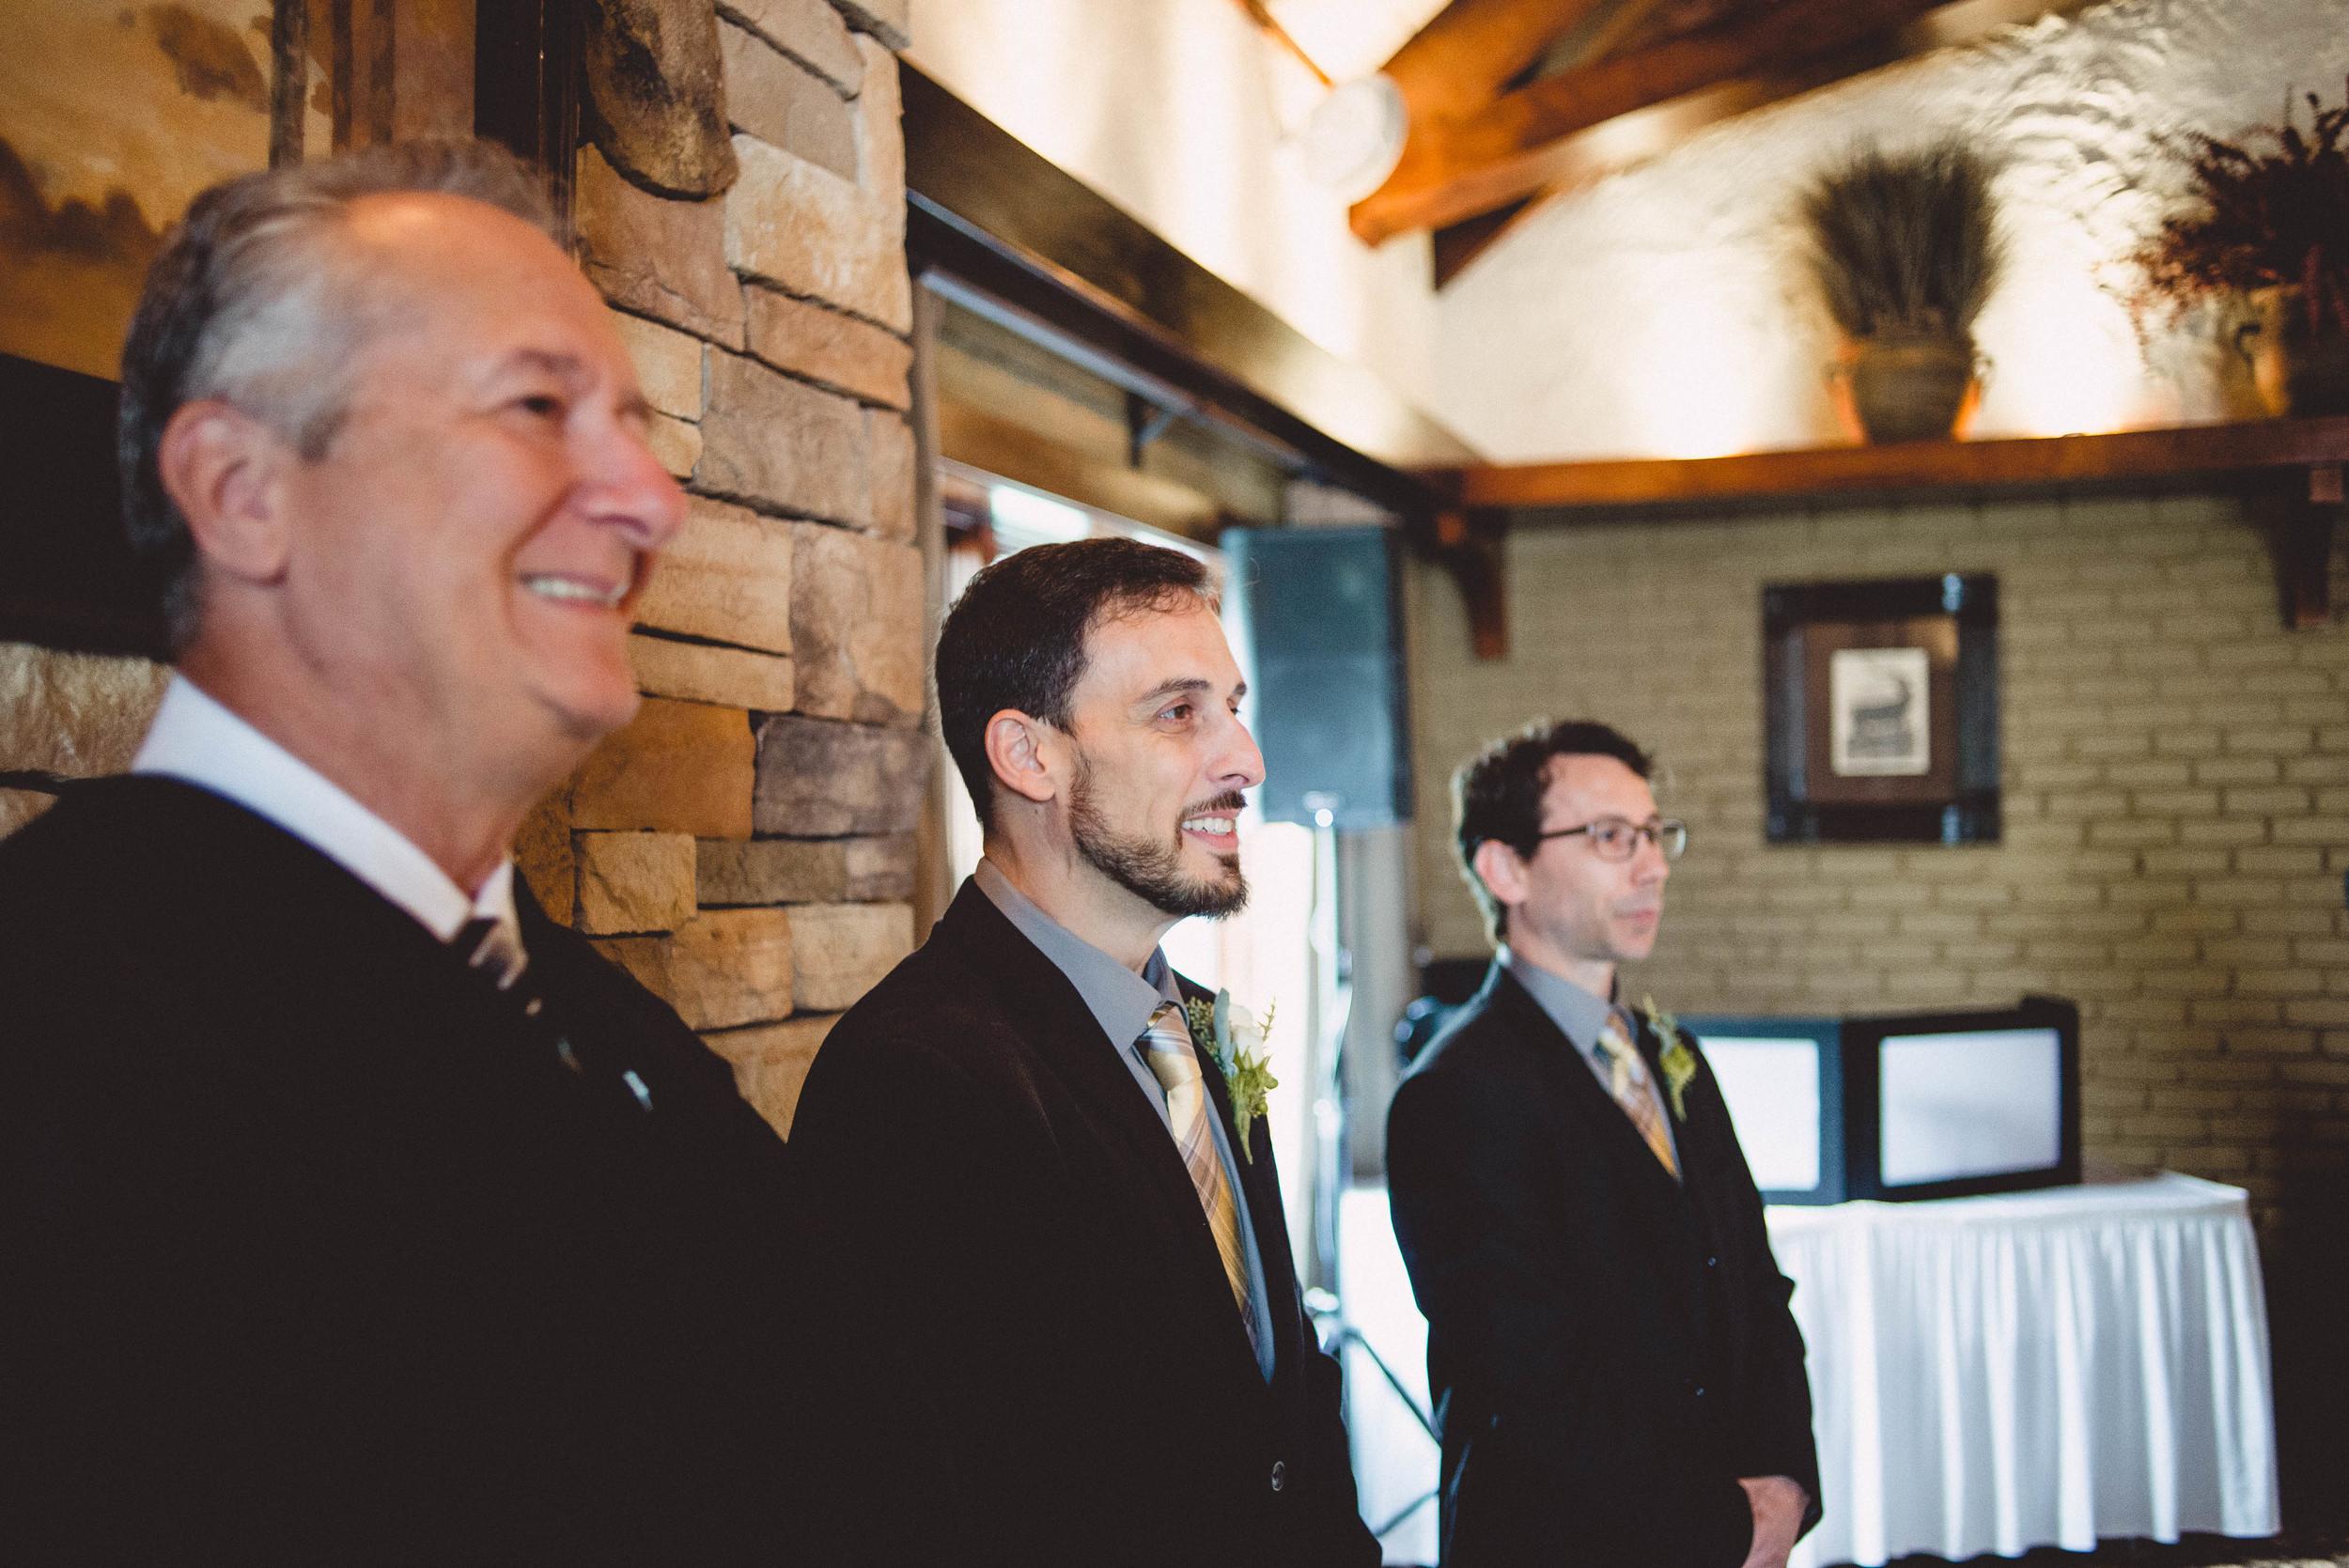 Matt and Shannon Wedding-20160730-17-30-41.JPG